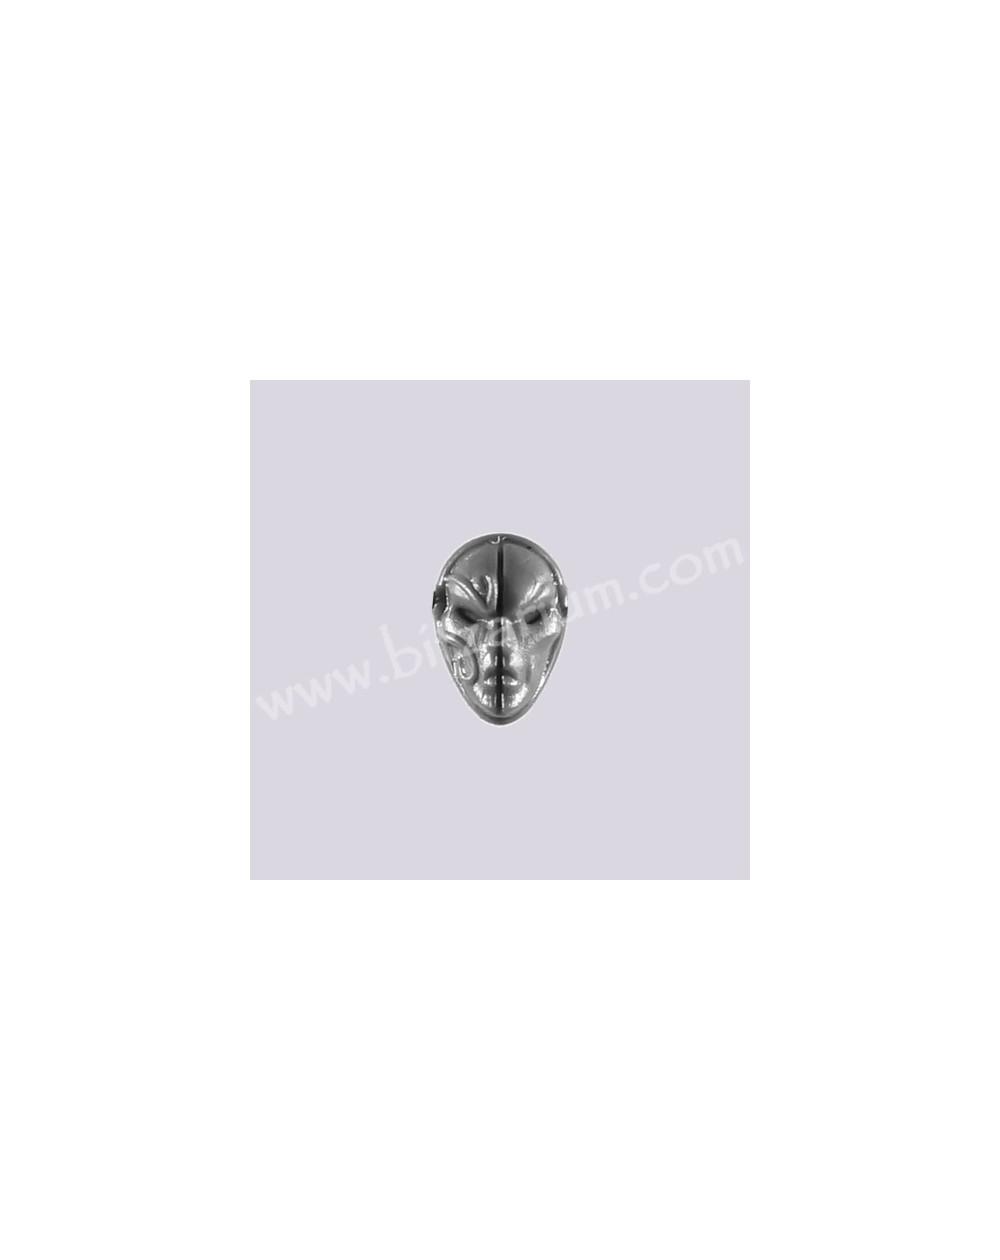 Harlequin Mask 3 - Skyweavers